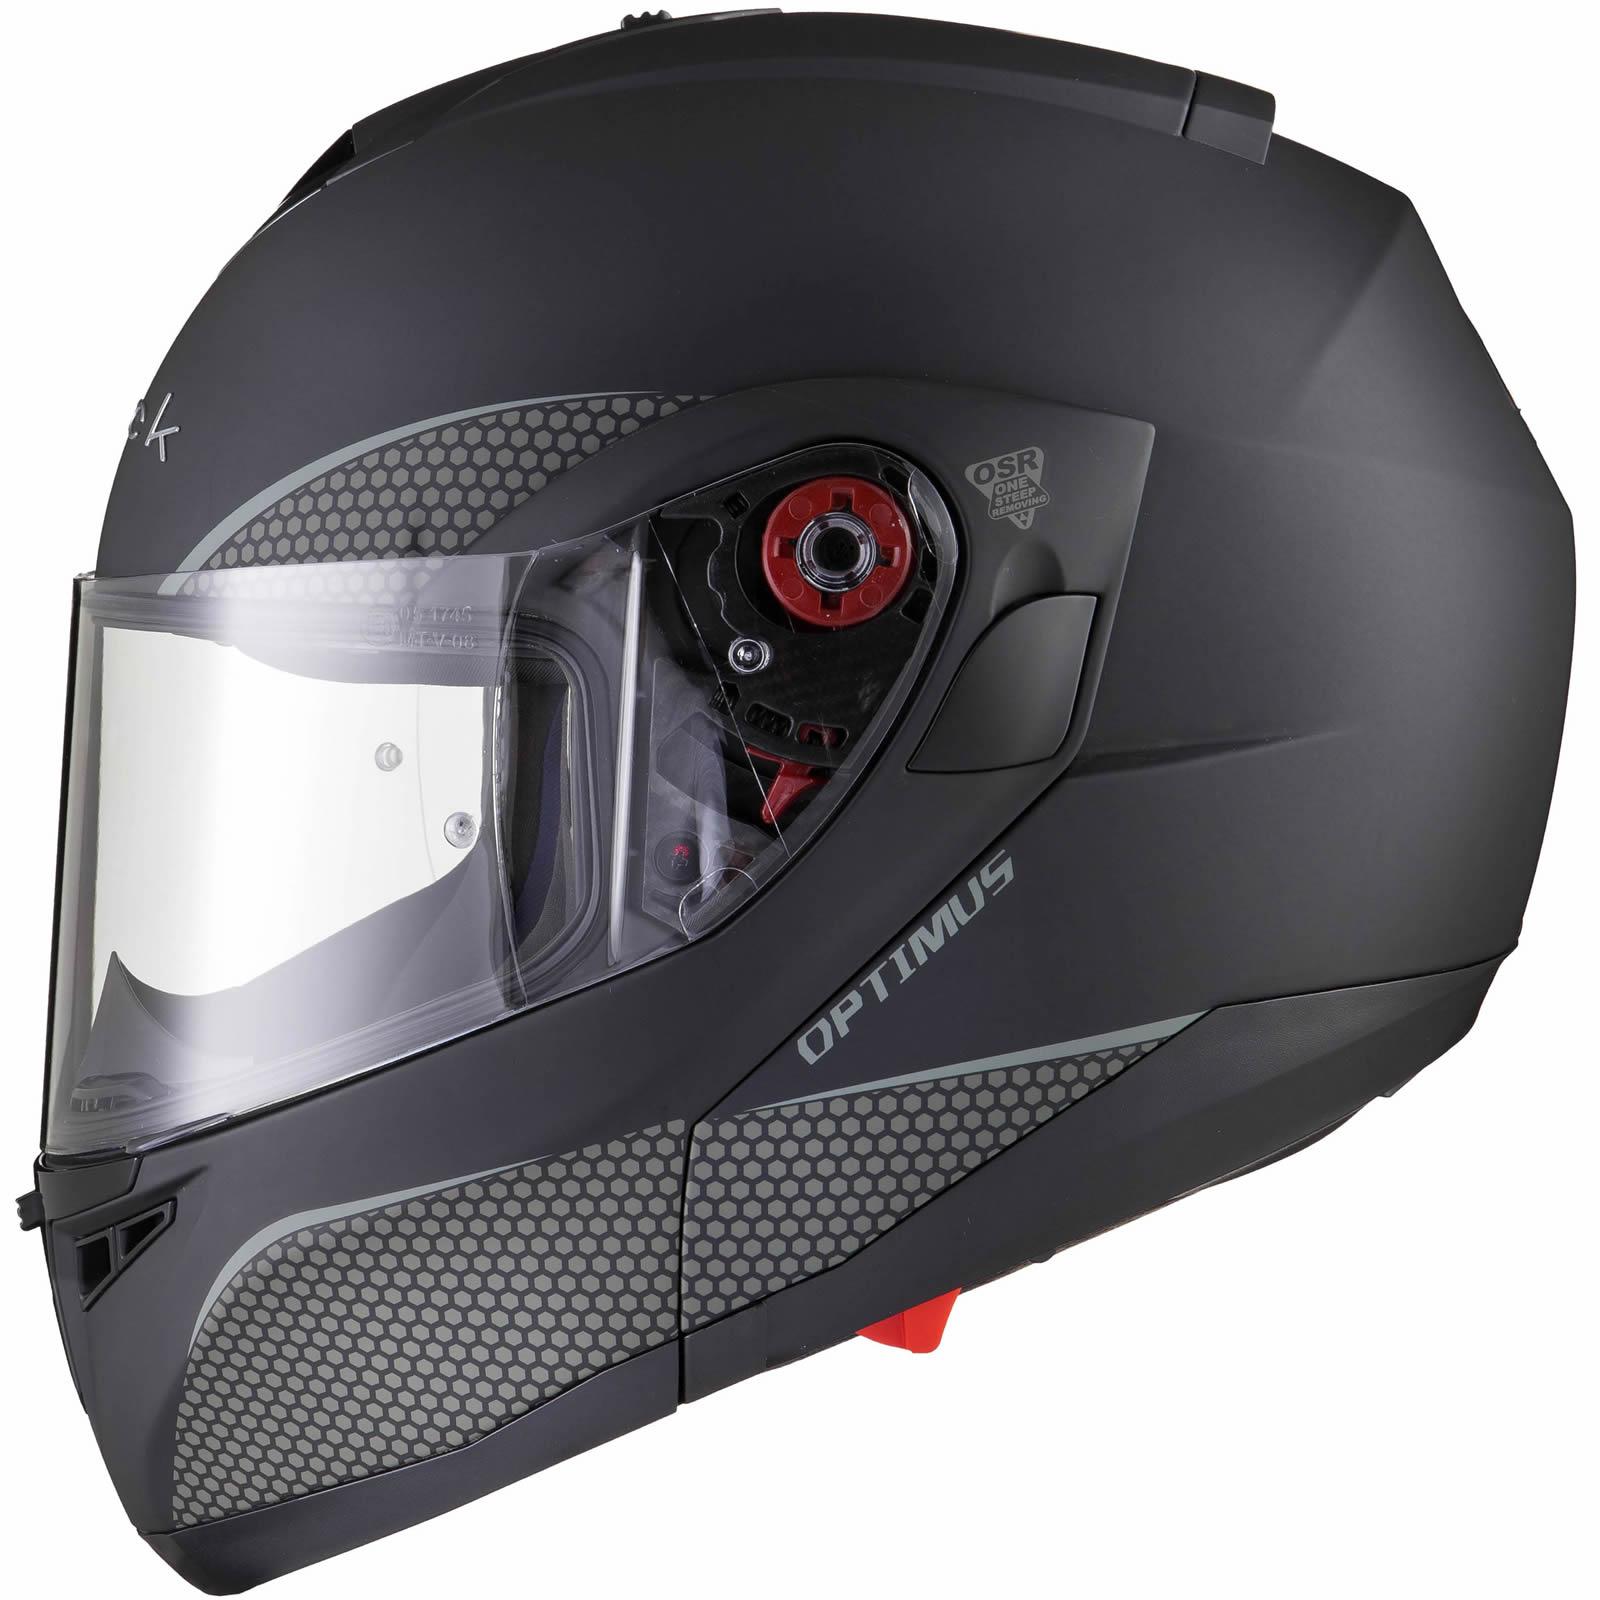 Black-Optimus-SV-Max-Vision-Flip-Up-Front-Motorcycle-Helmet-Pinlock-Ready-Visor thumbnail 23